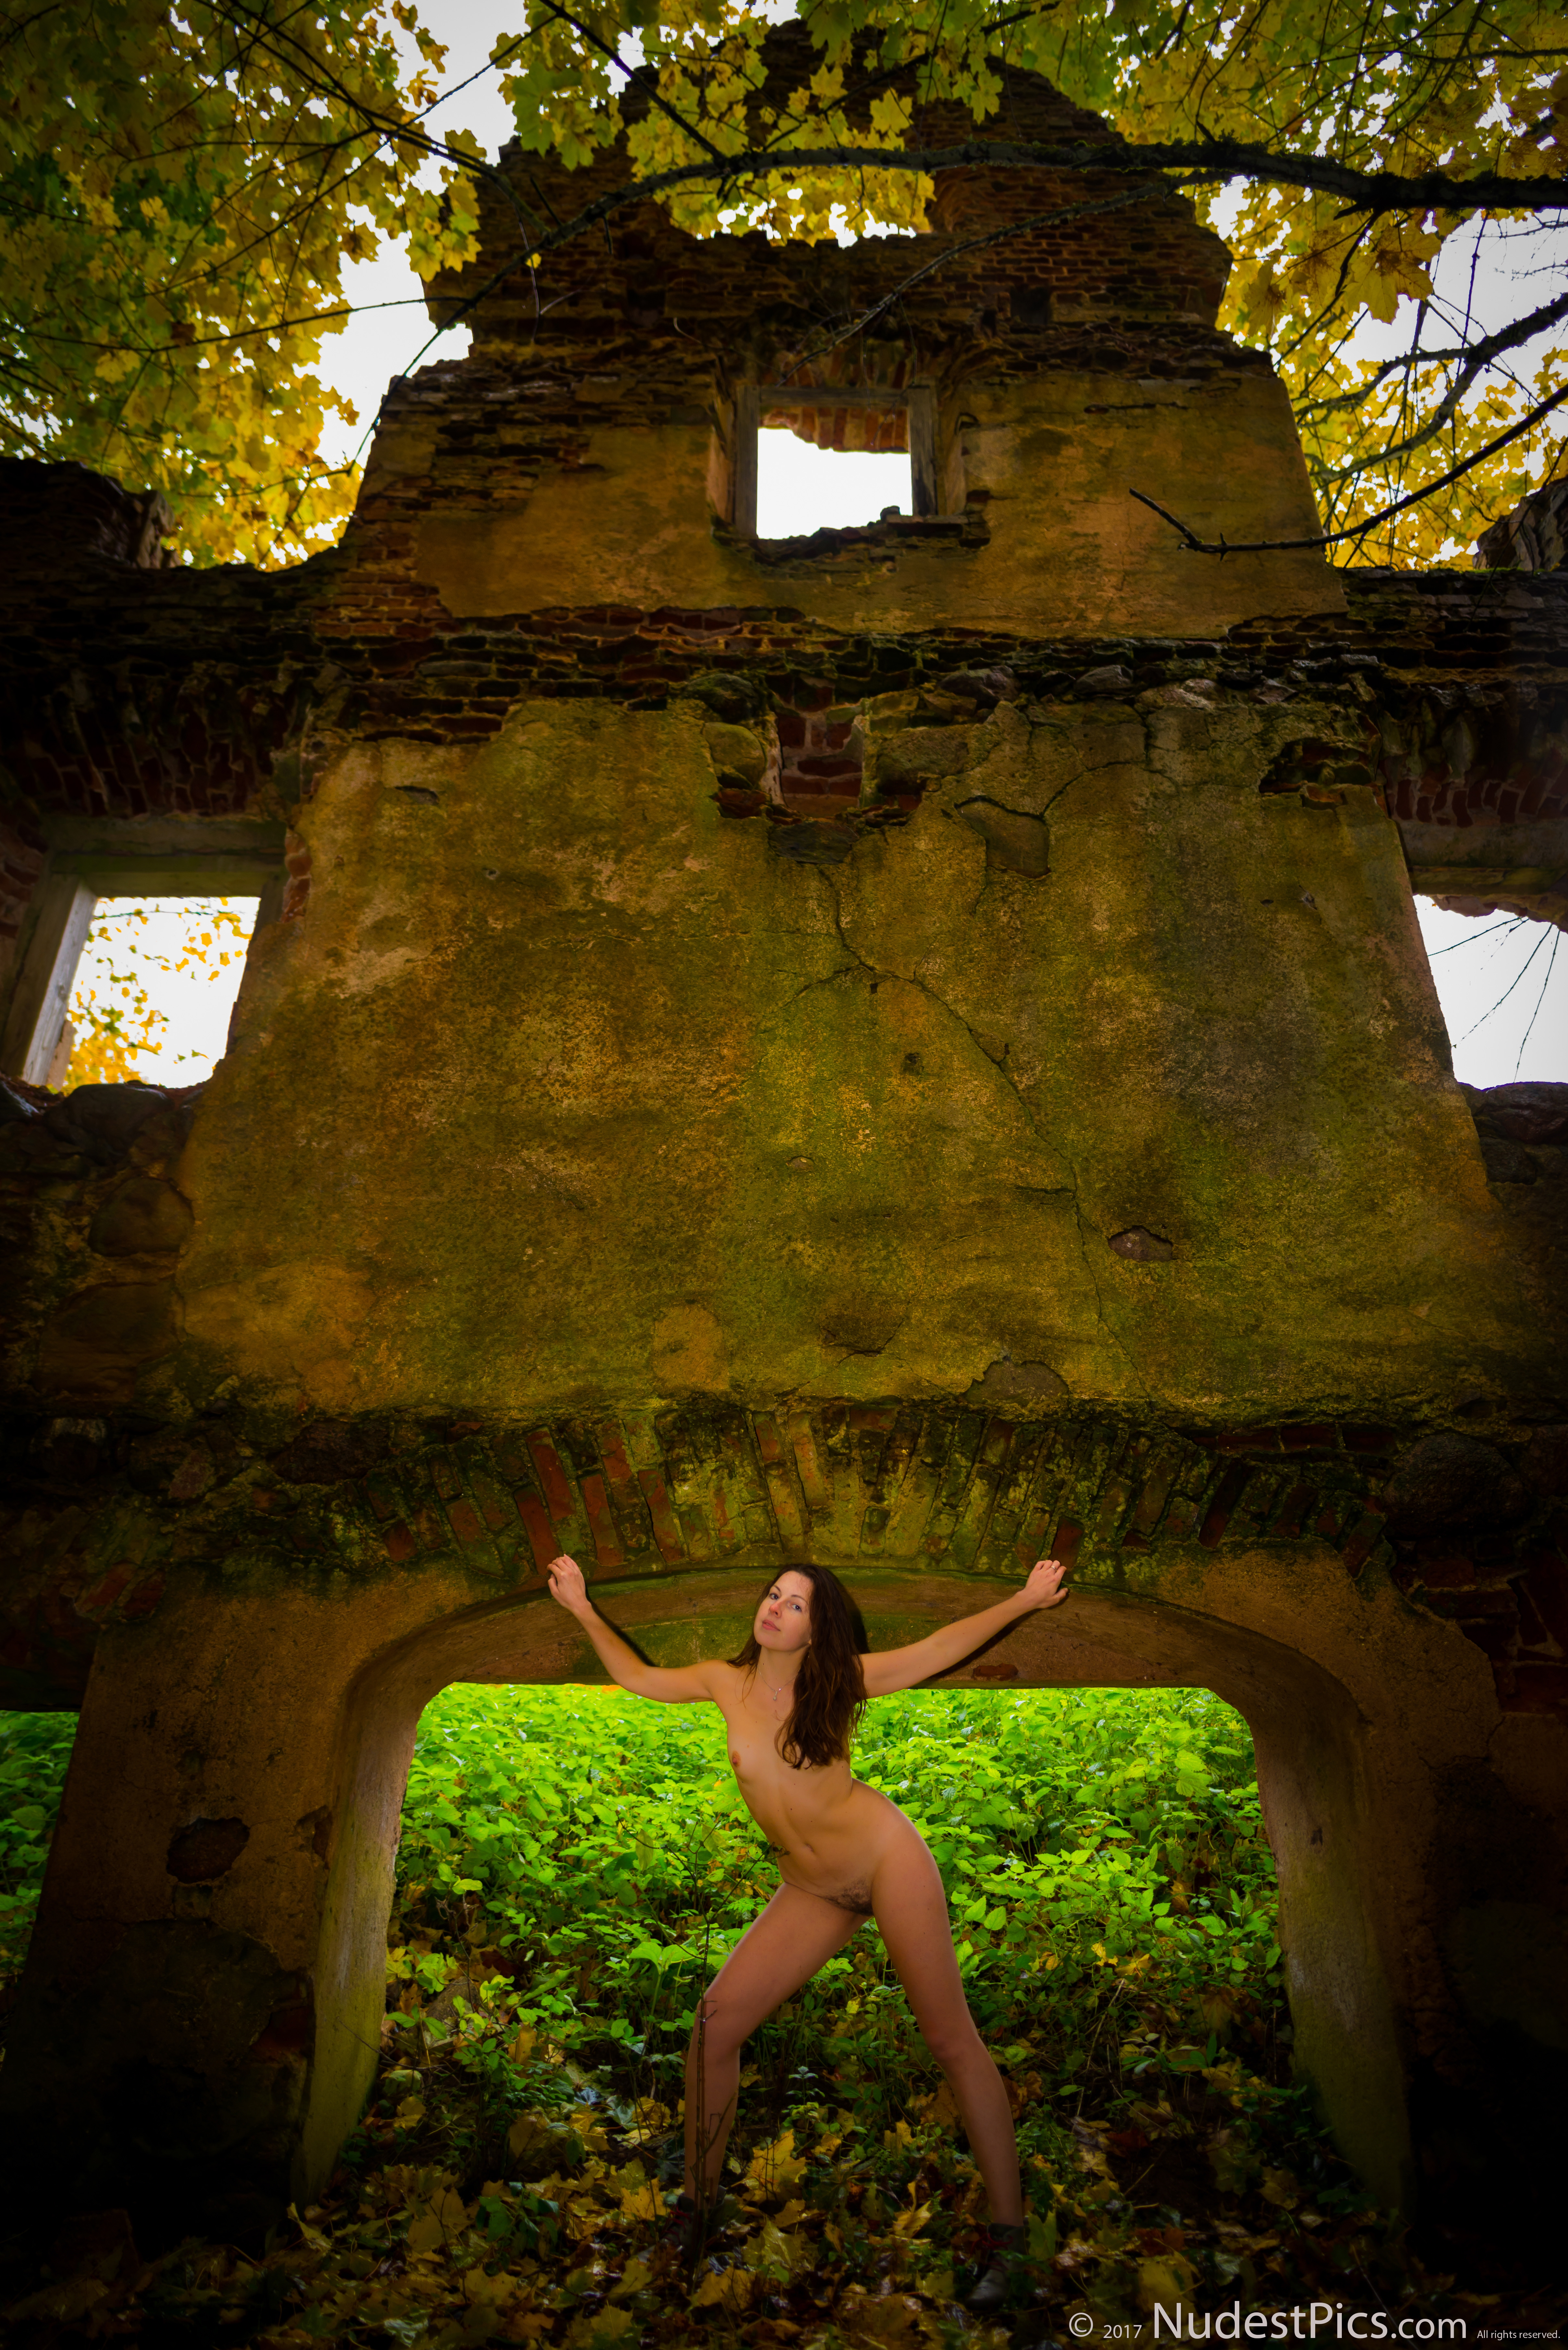 Nude Girl Posing at the Ruined Wall HD